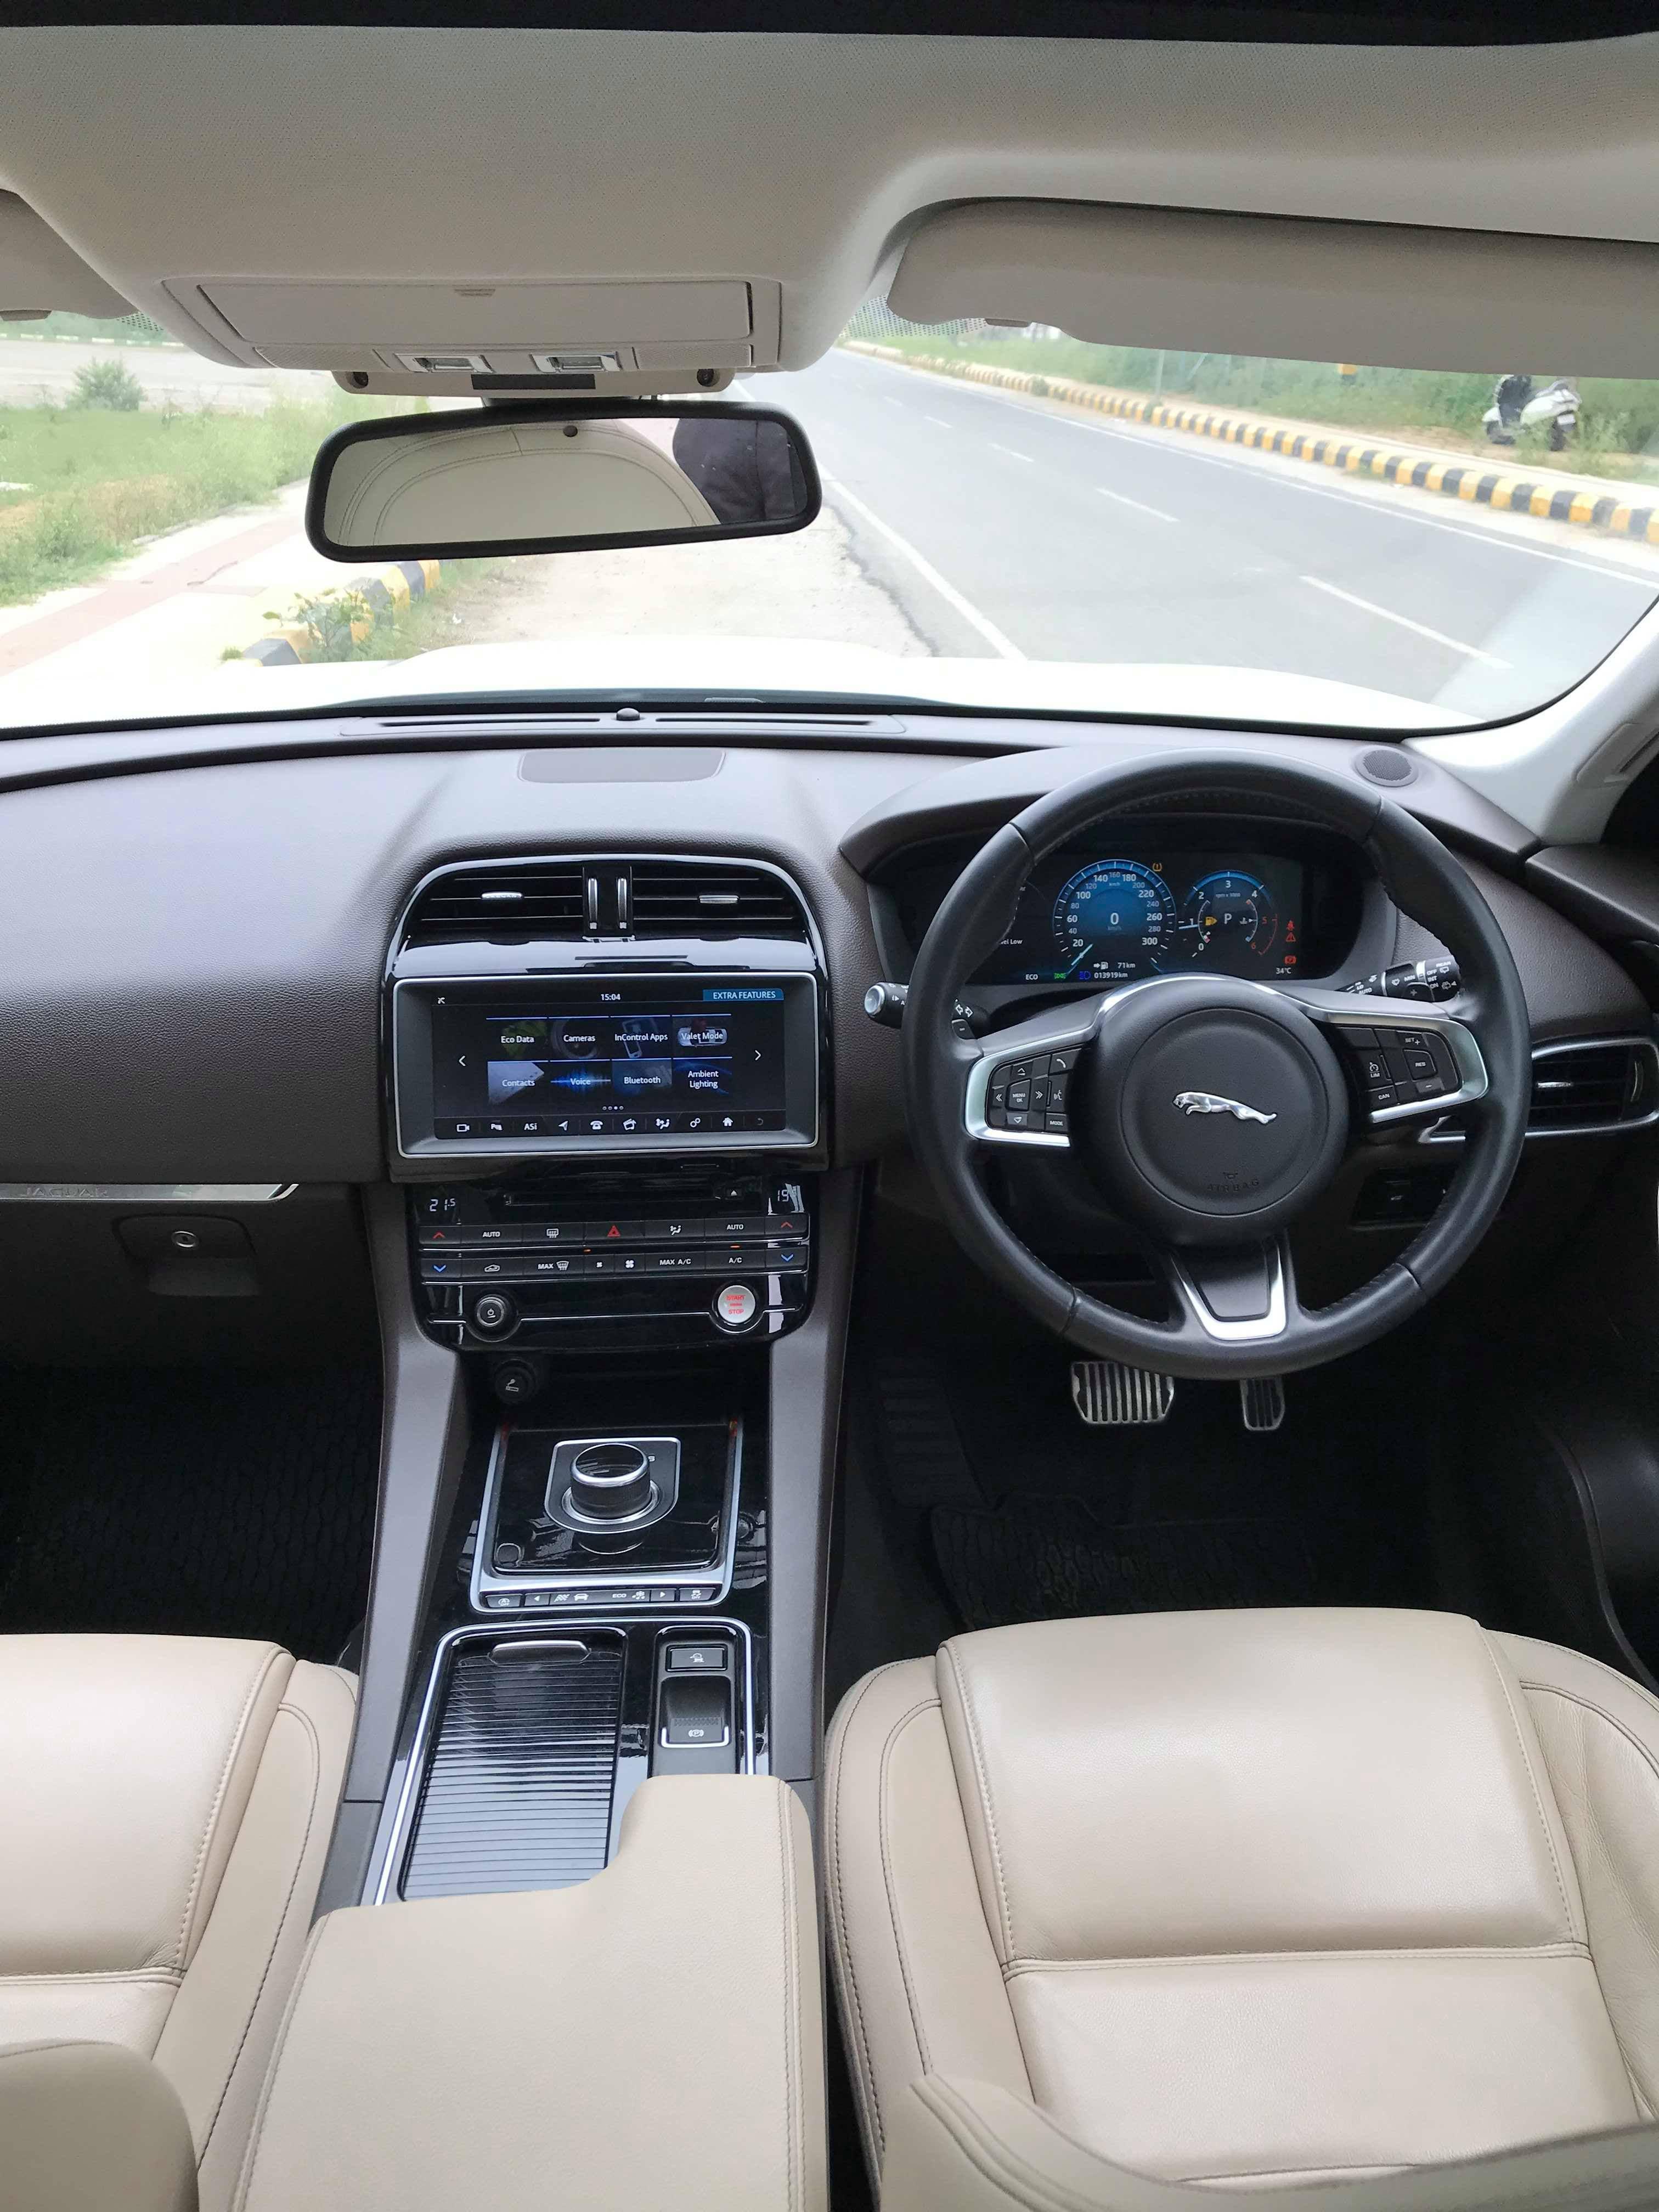 Jaguar F Pace 20d Awd Prestige 2019 Real Life Review Jaguar Car Jaguar Awd